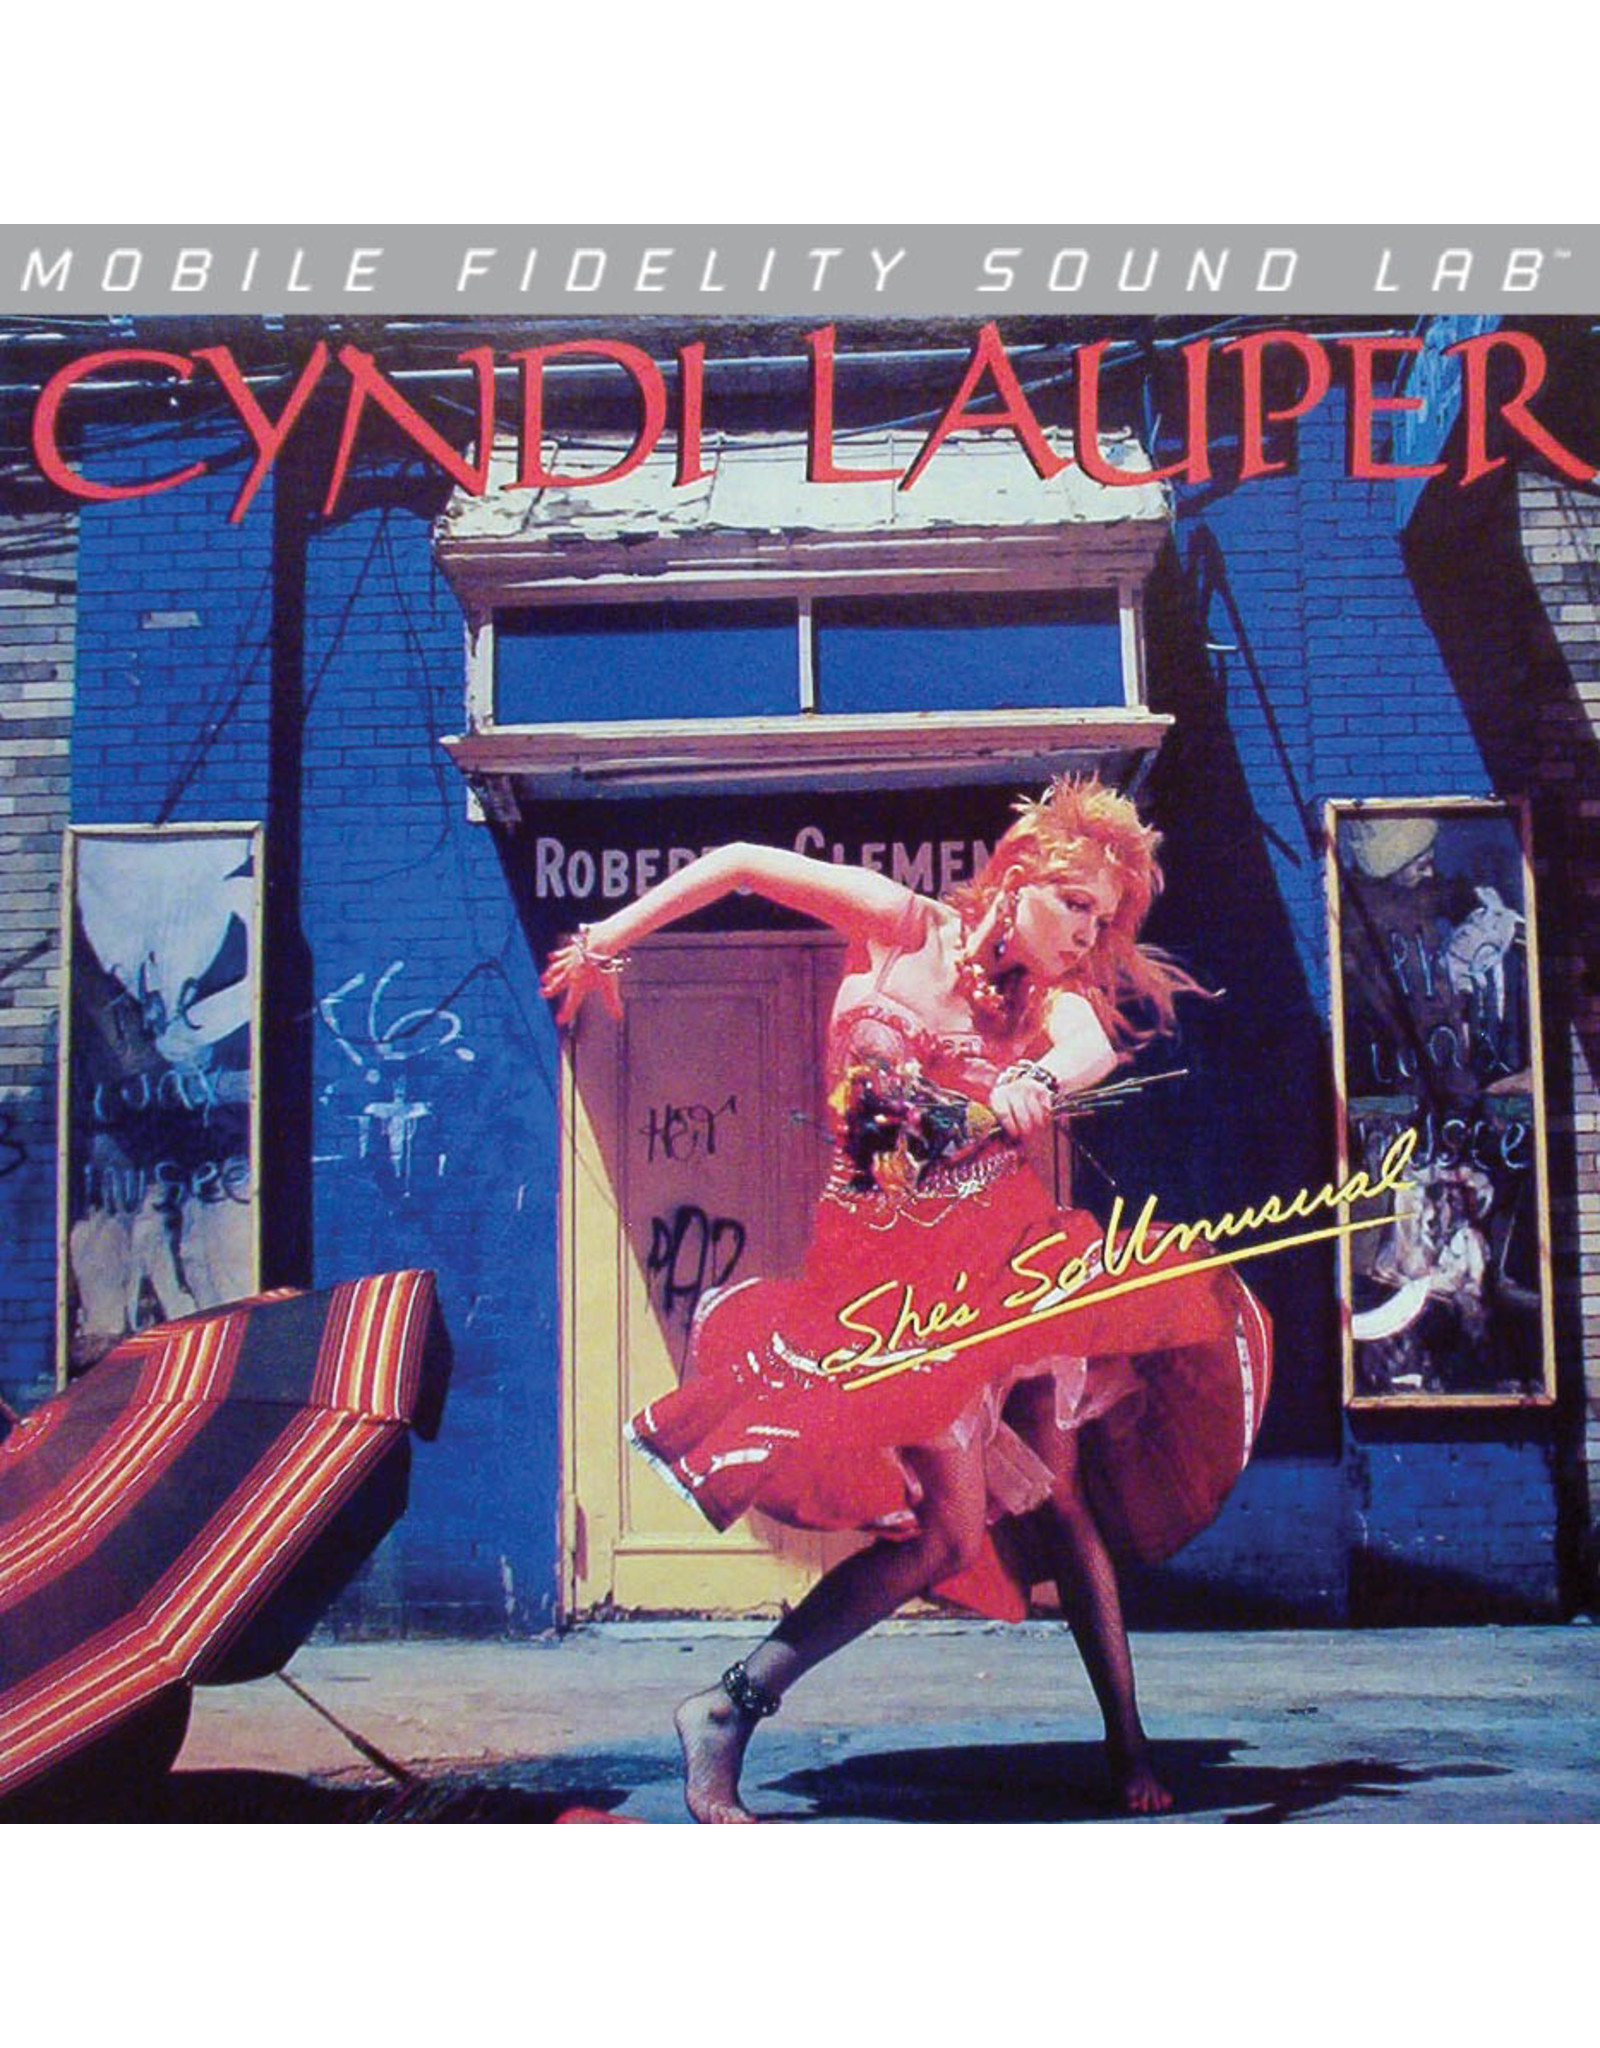 MoFi Cyndi Lauper - She's So Unusual LP